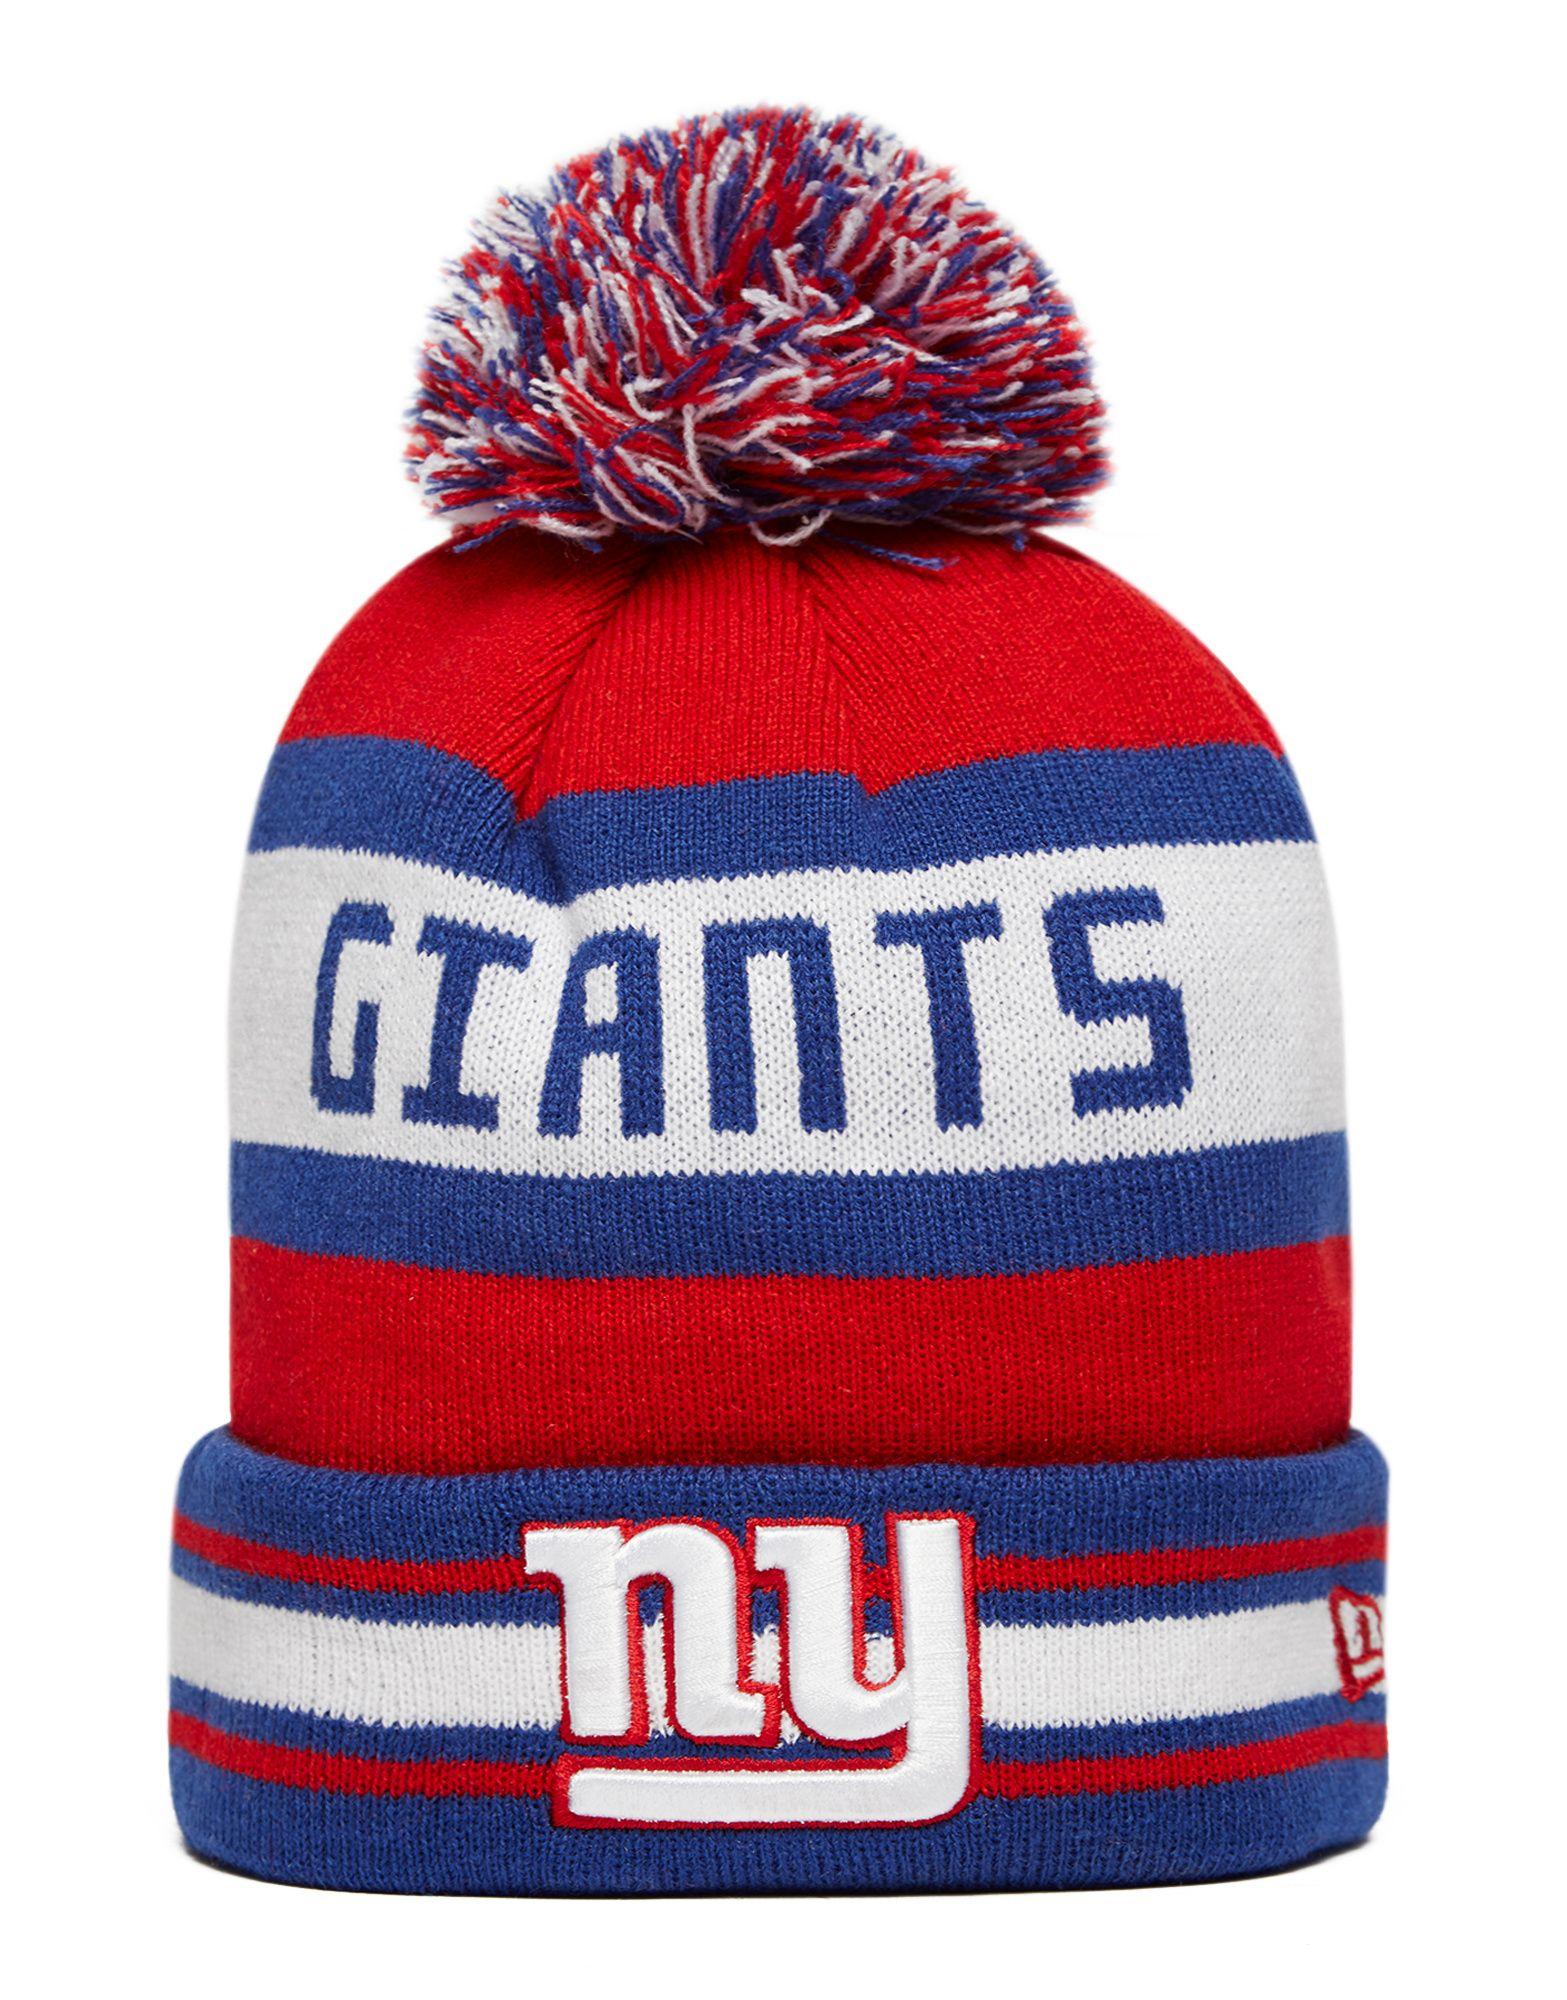 f2f8332ccf2 ... new style new era nfl new york giants jake bobble hat jd sports be2f0  1084b